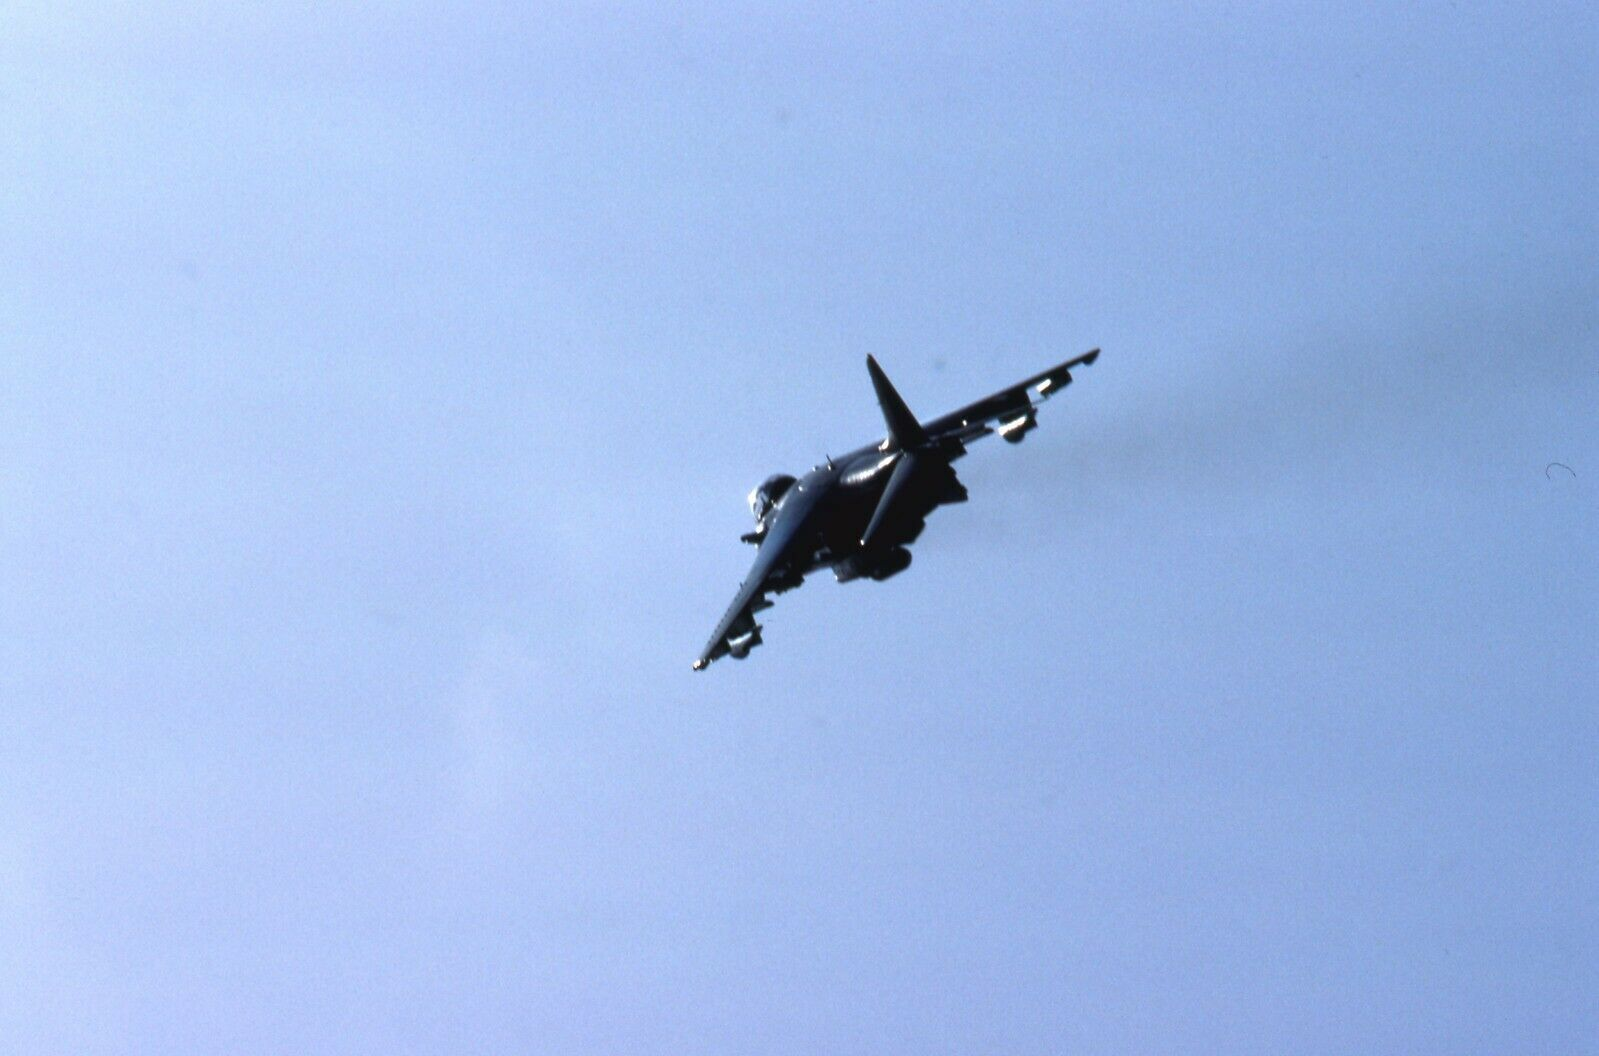 British Aerospace Harrier   Royal Air Force Military Print EXCLUSIVE